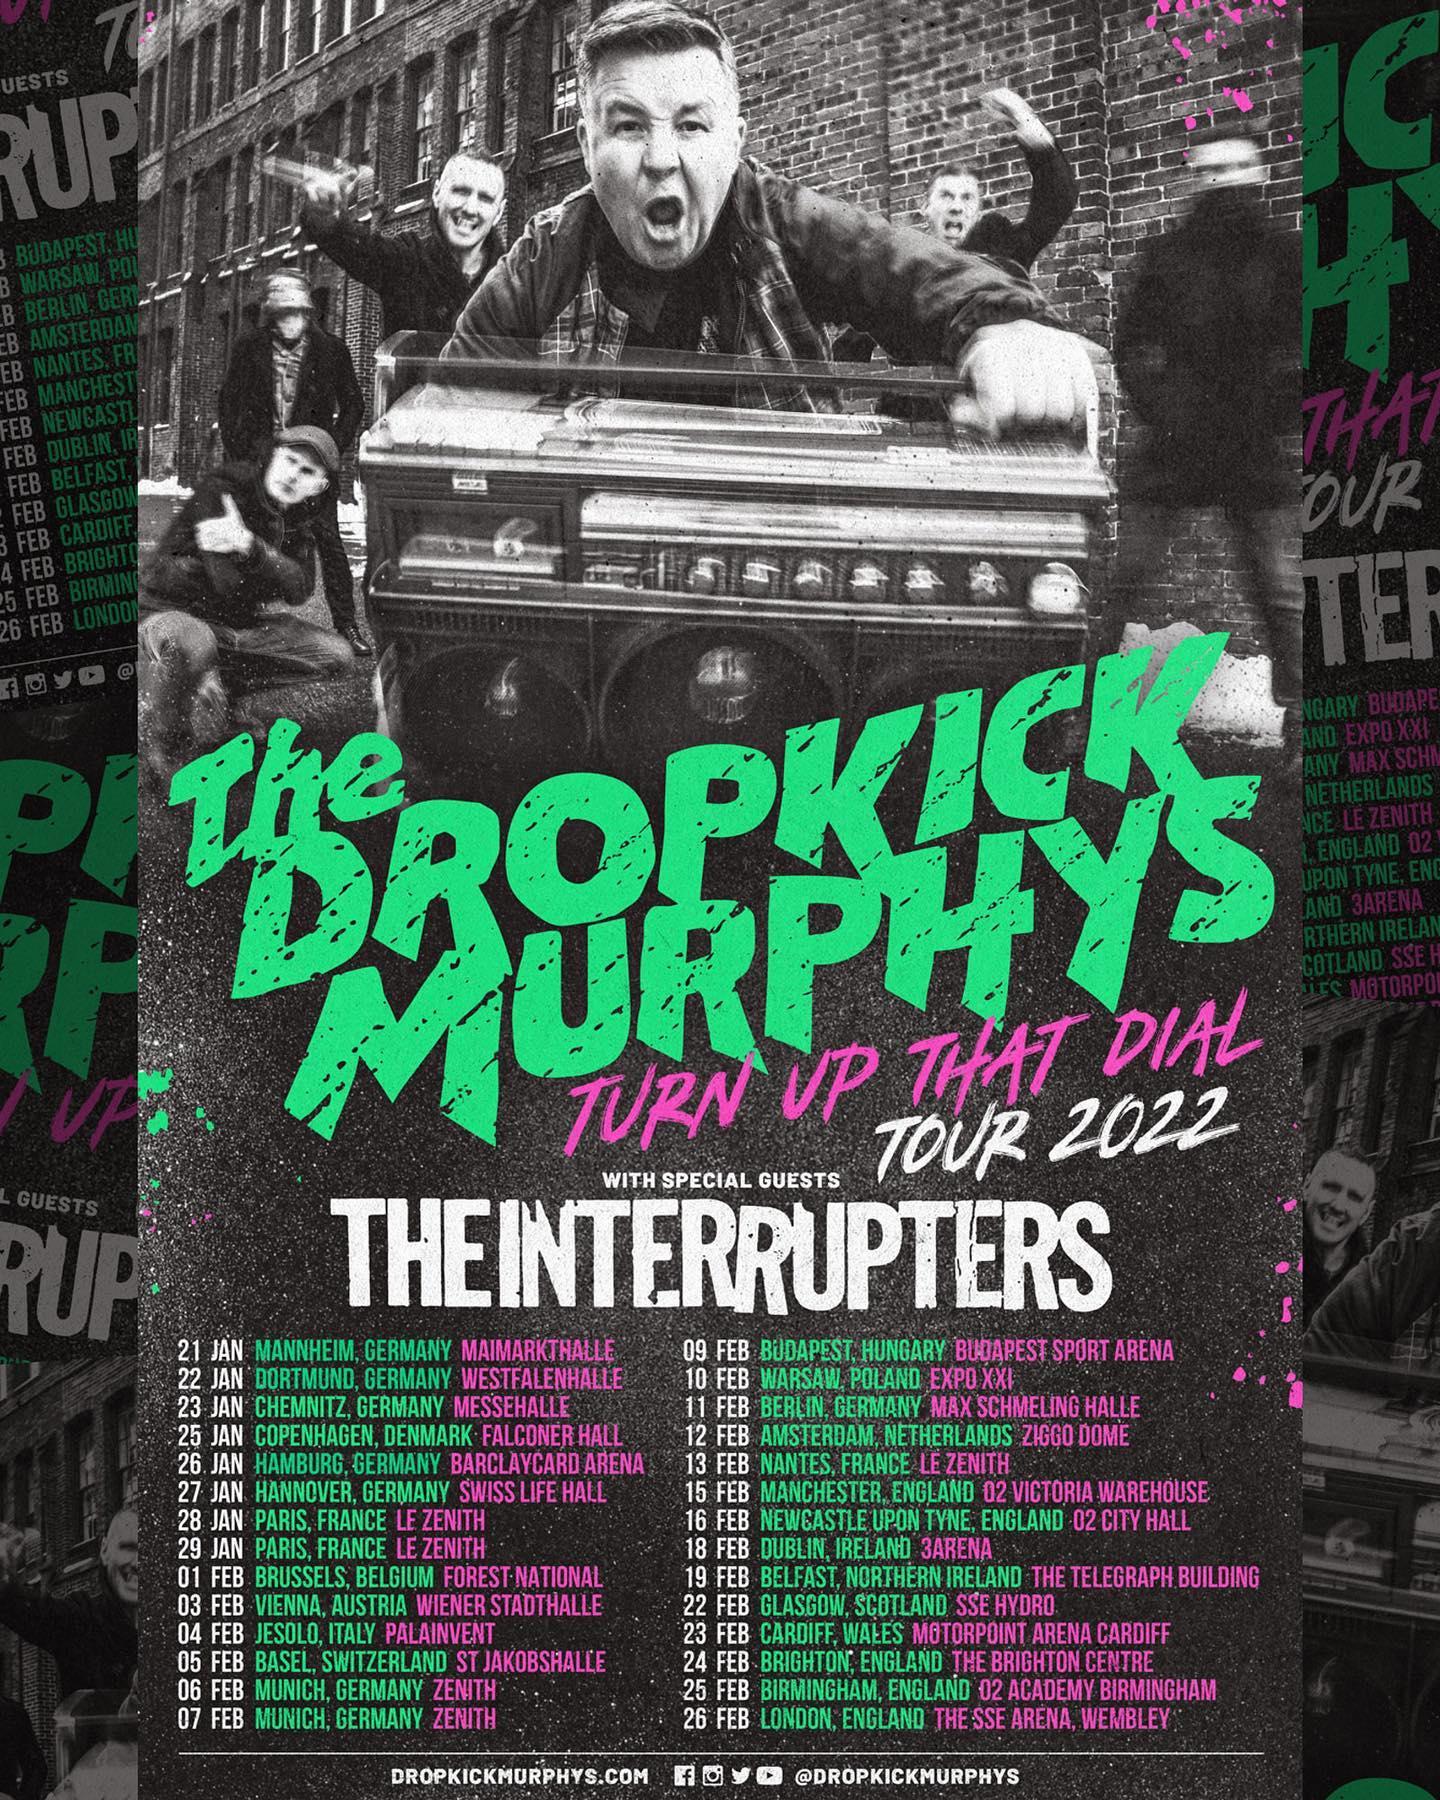 Dropkick Murphys - Tun Up That Dial Tour 2022 w. The Interrupters